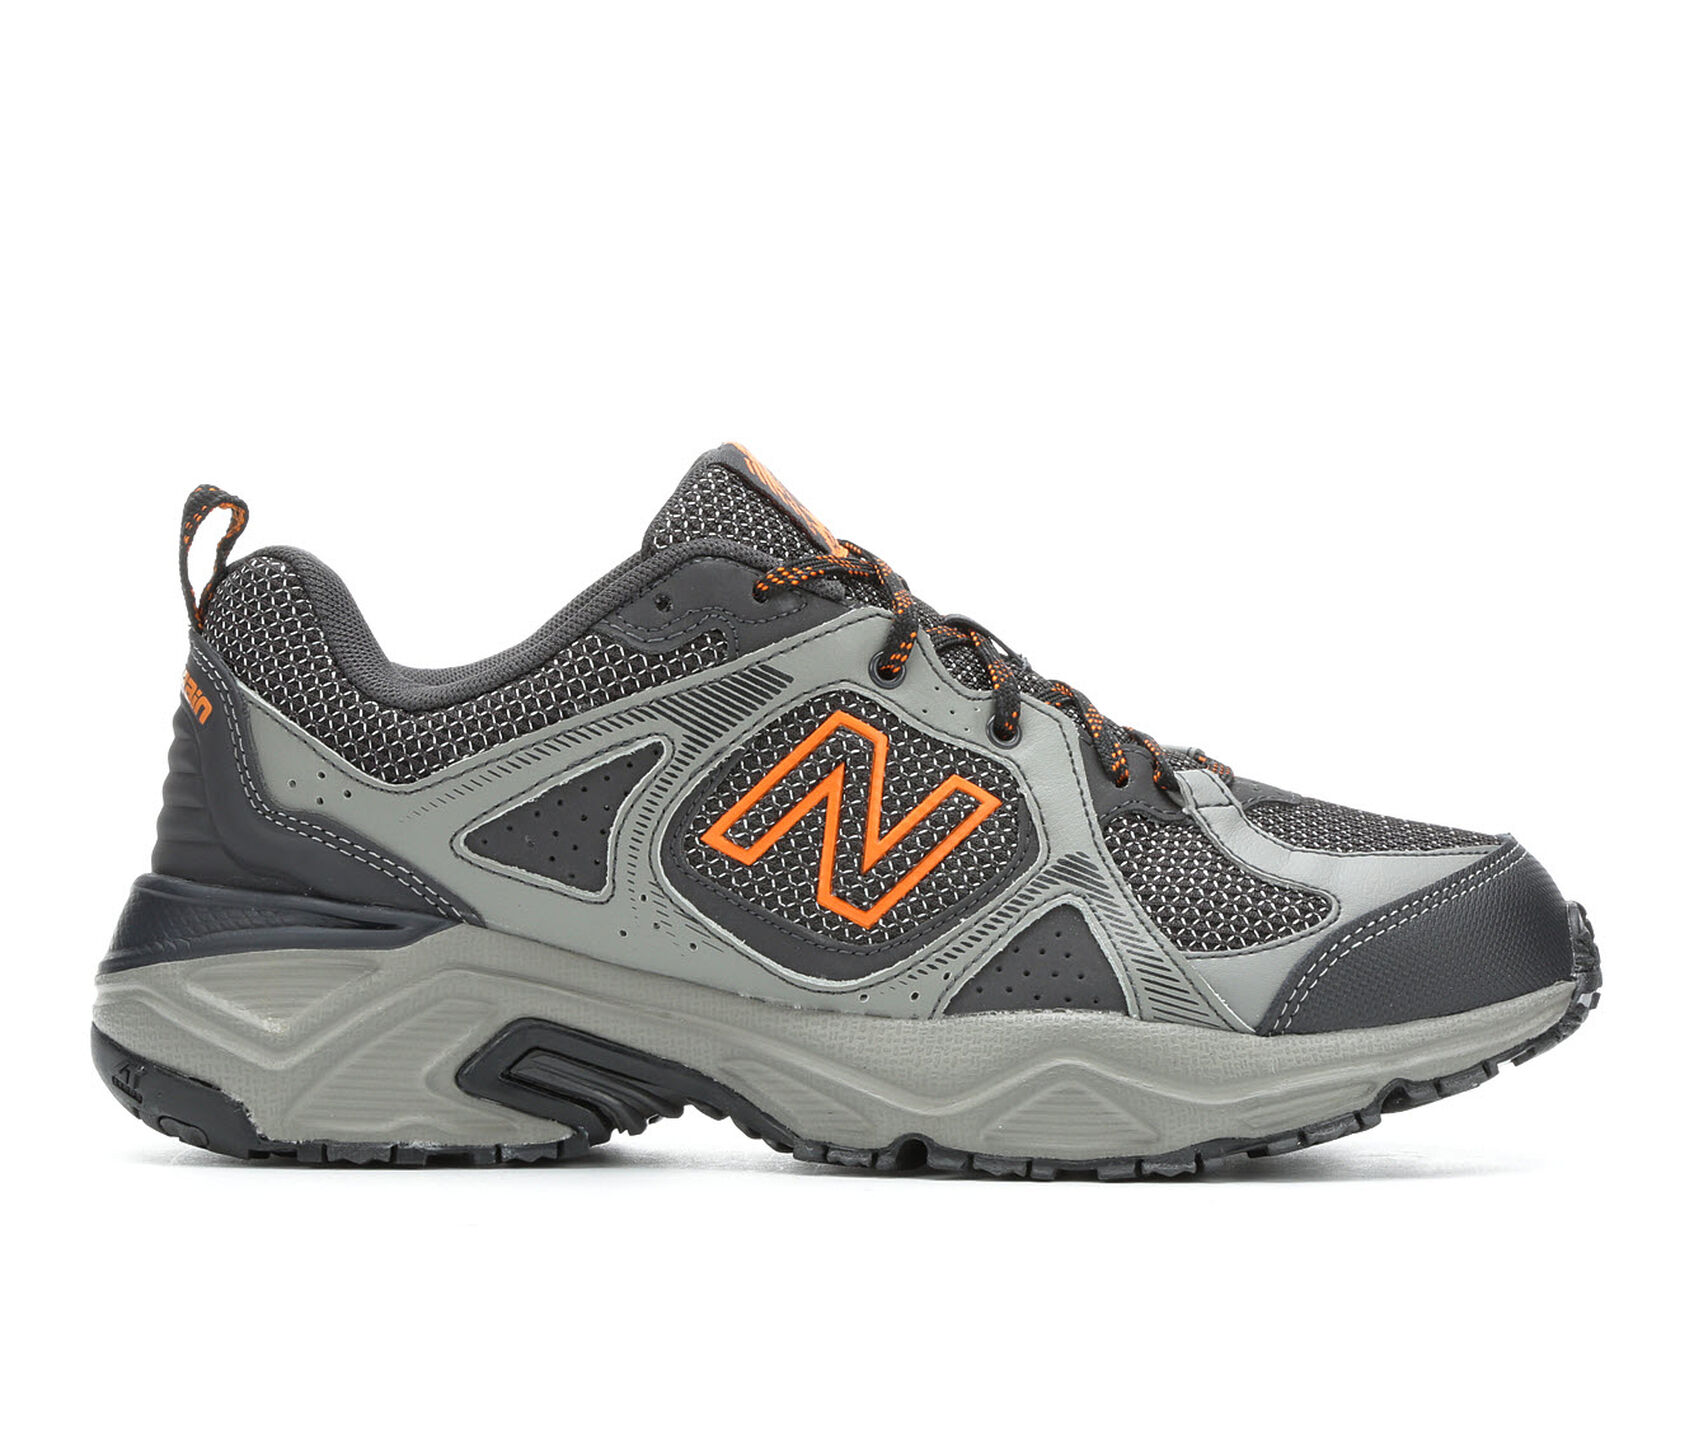 bf24776e3b Men's New Balance MT481 Trail Running Shoes